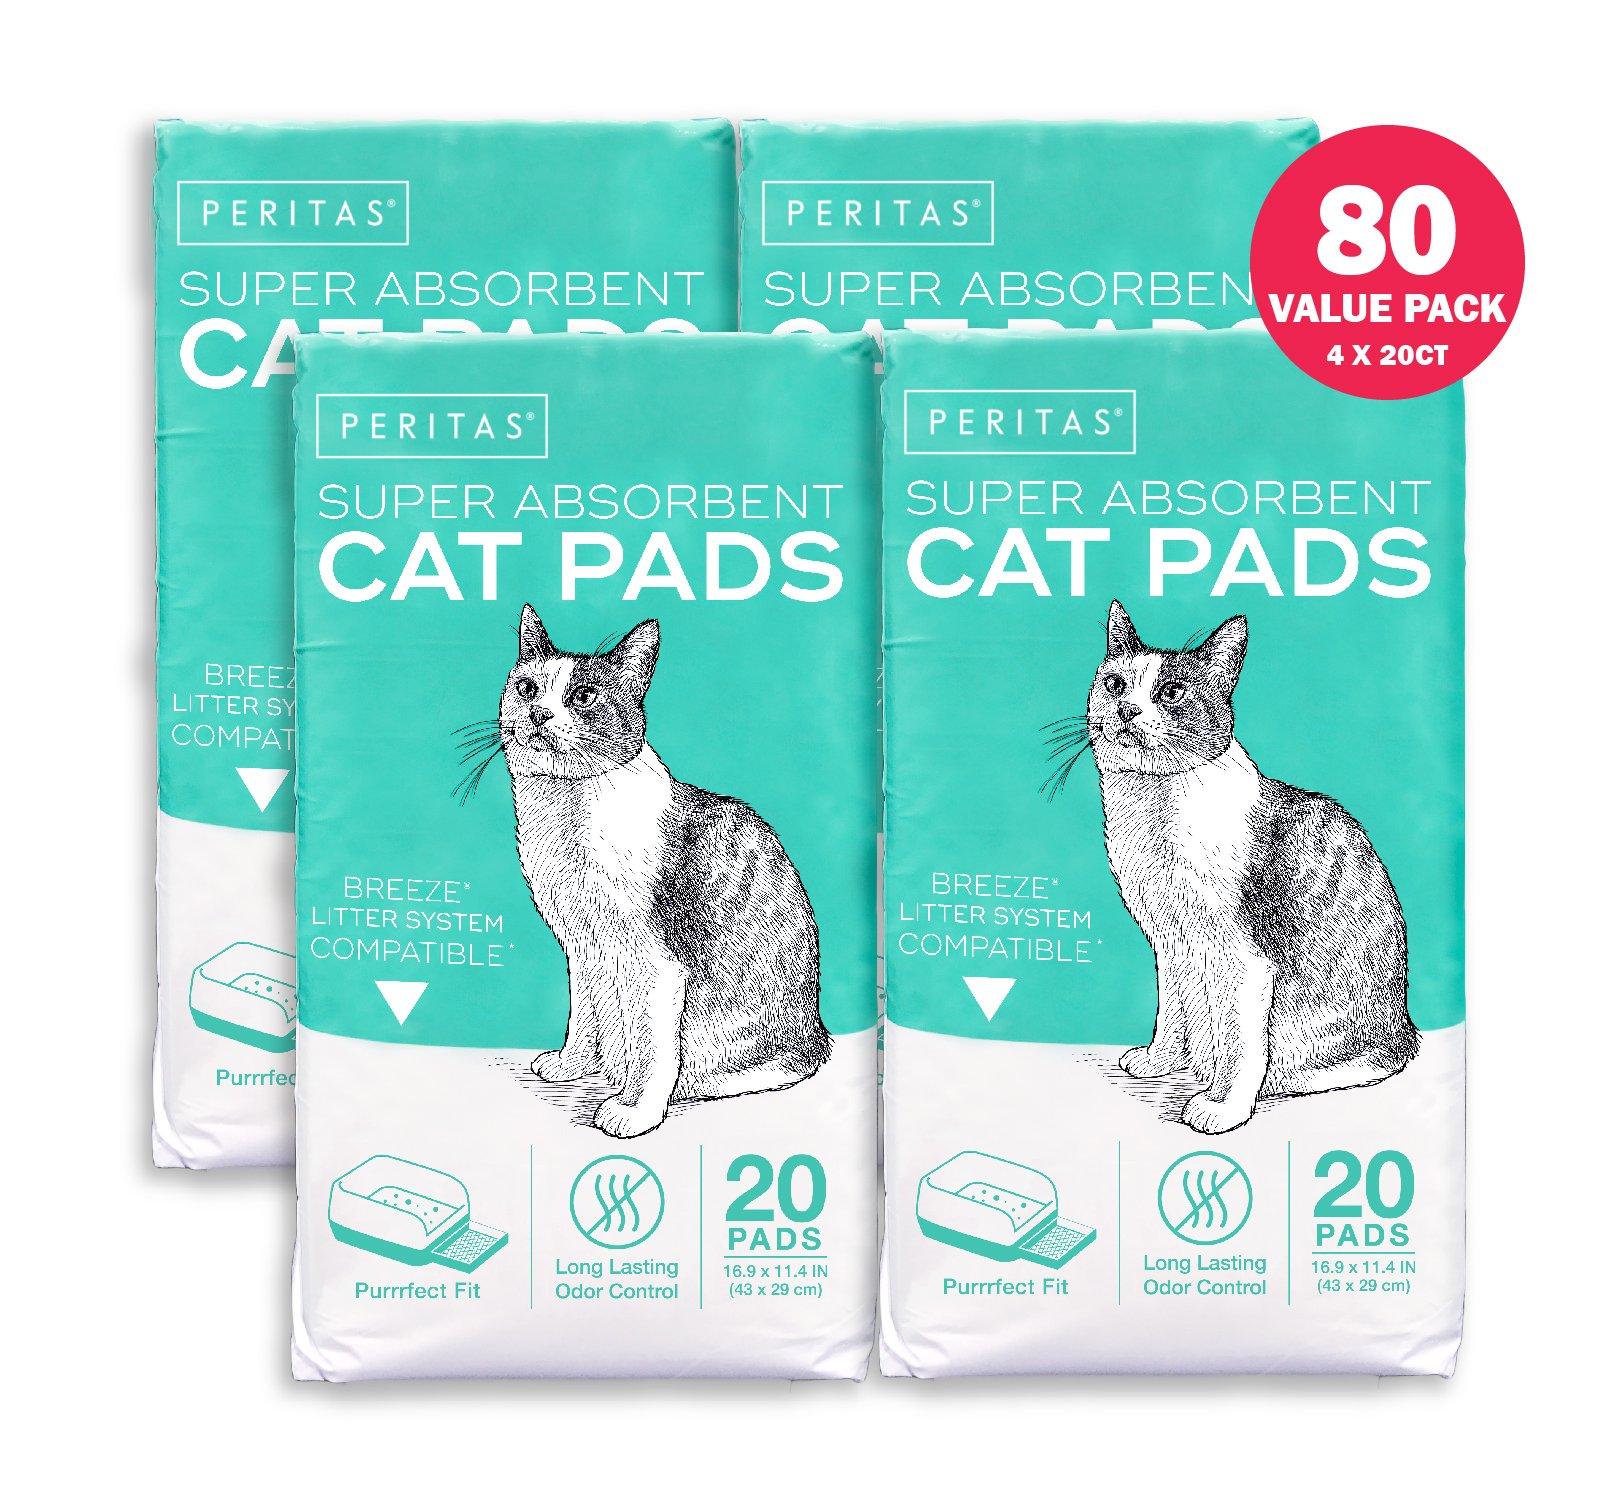 Peritas Cat Pads Generic Refill for Breeze Tidy Cat Litter System 16.9''x11.4'' (80 Count) by Peritas